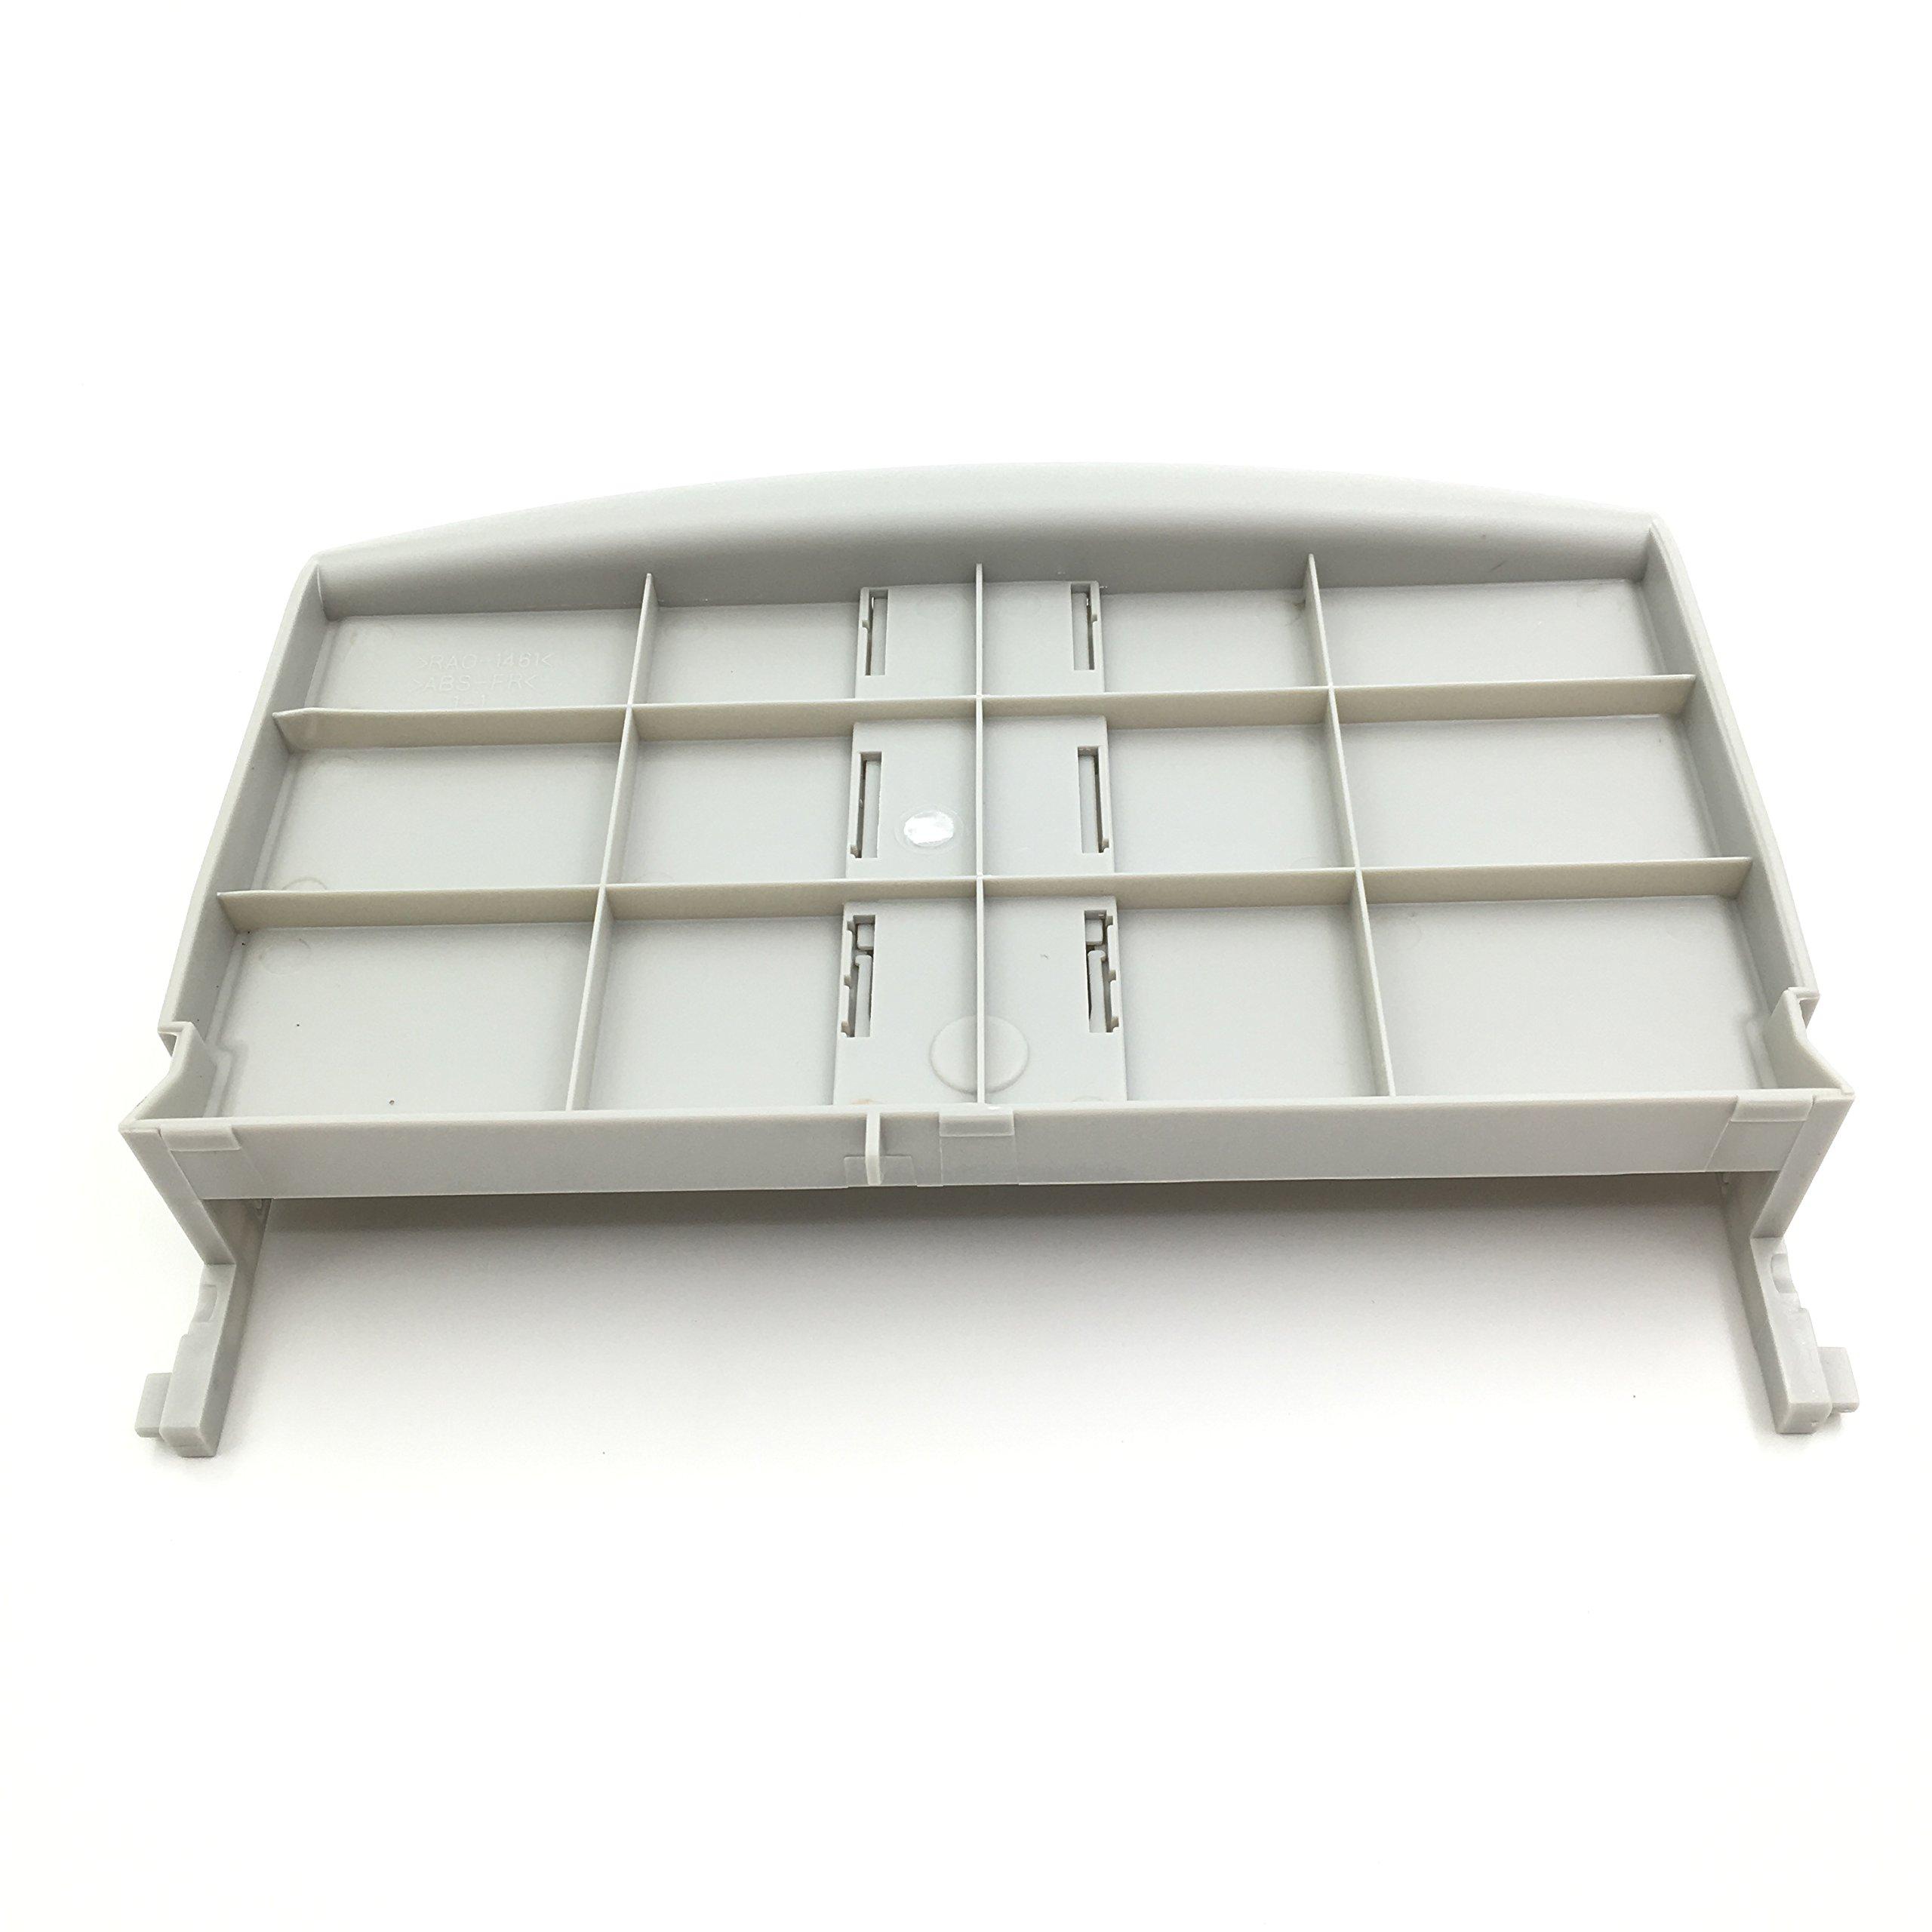 OKLILI RG0-1121-000 RG0-1013-000 RM1-0553 RM1-0554 Paper Input Tray for HP 1000 1200 1220 1300 1150 3300 3310 3320 3330 3380 by OKLILI (Image #3)